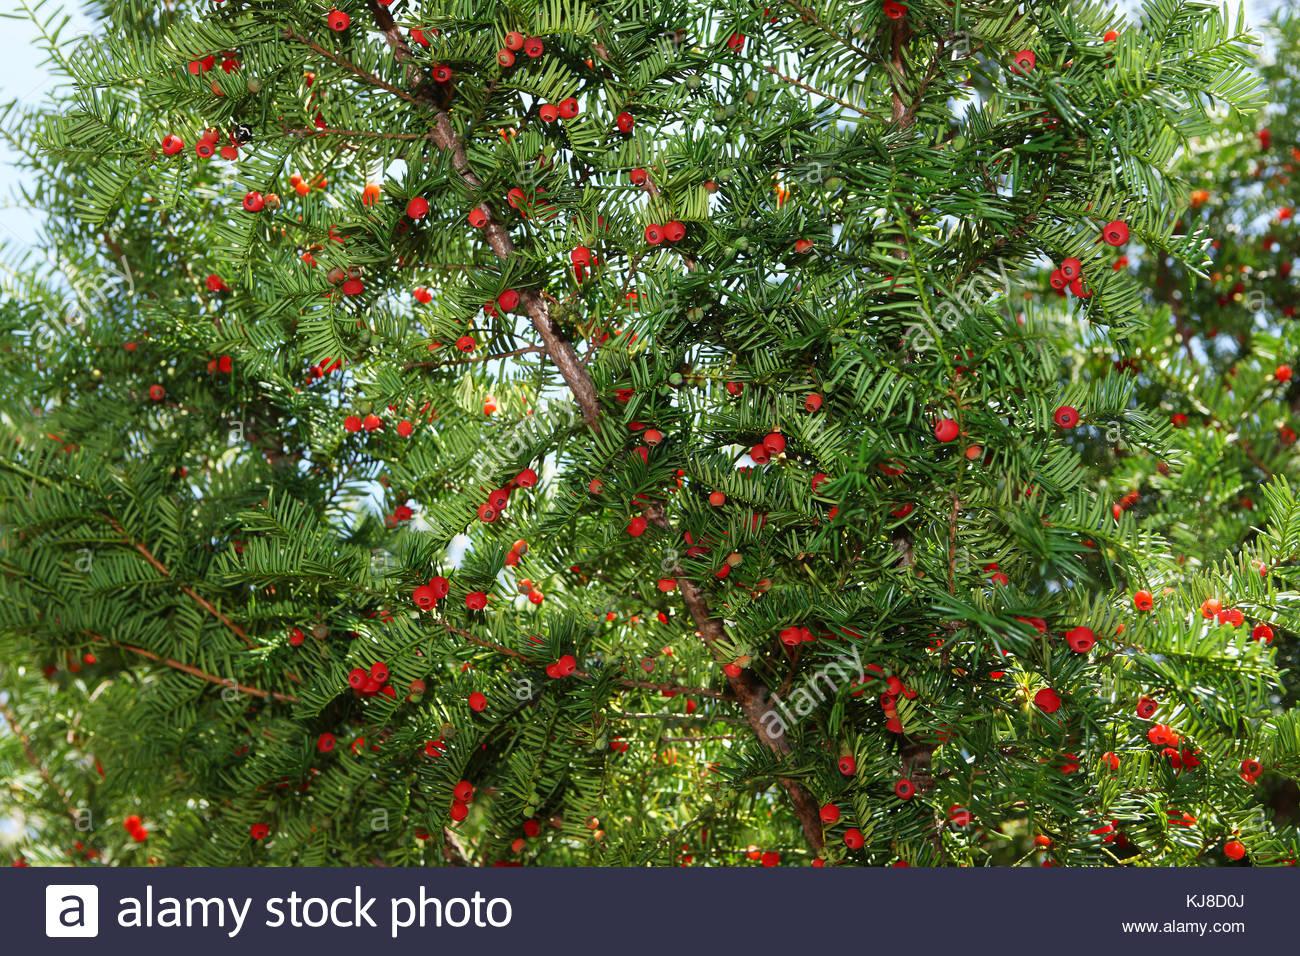 Berries of yew tree - Stock Image